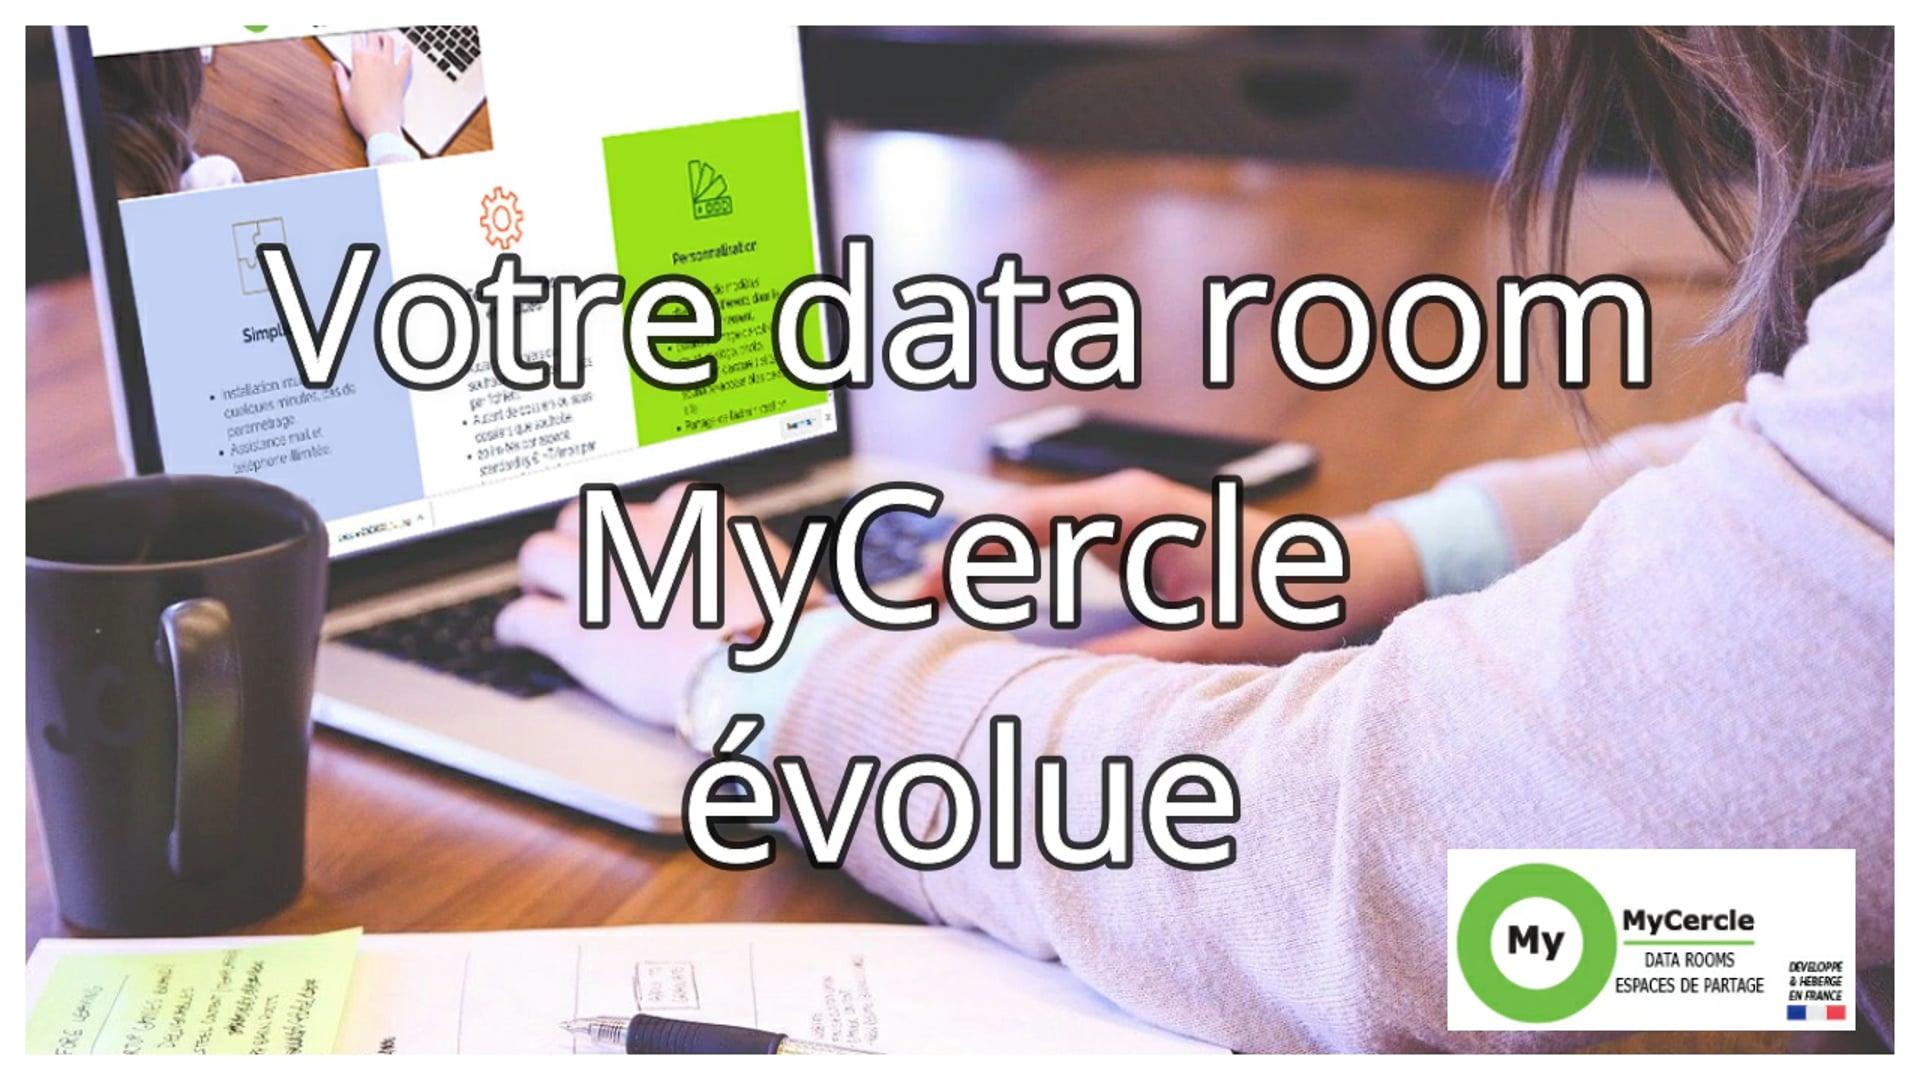 MyCercle Data Room